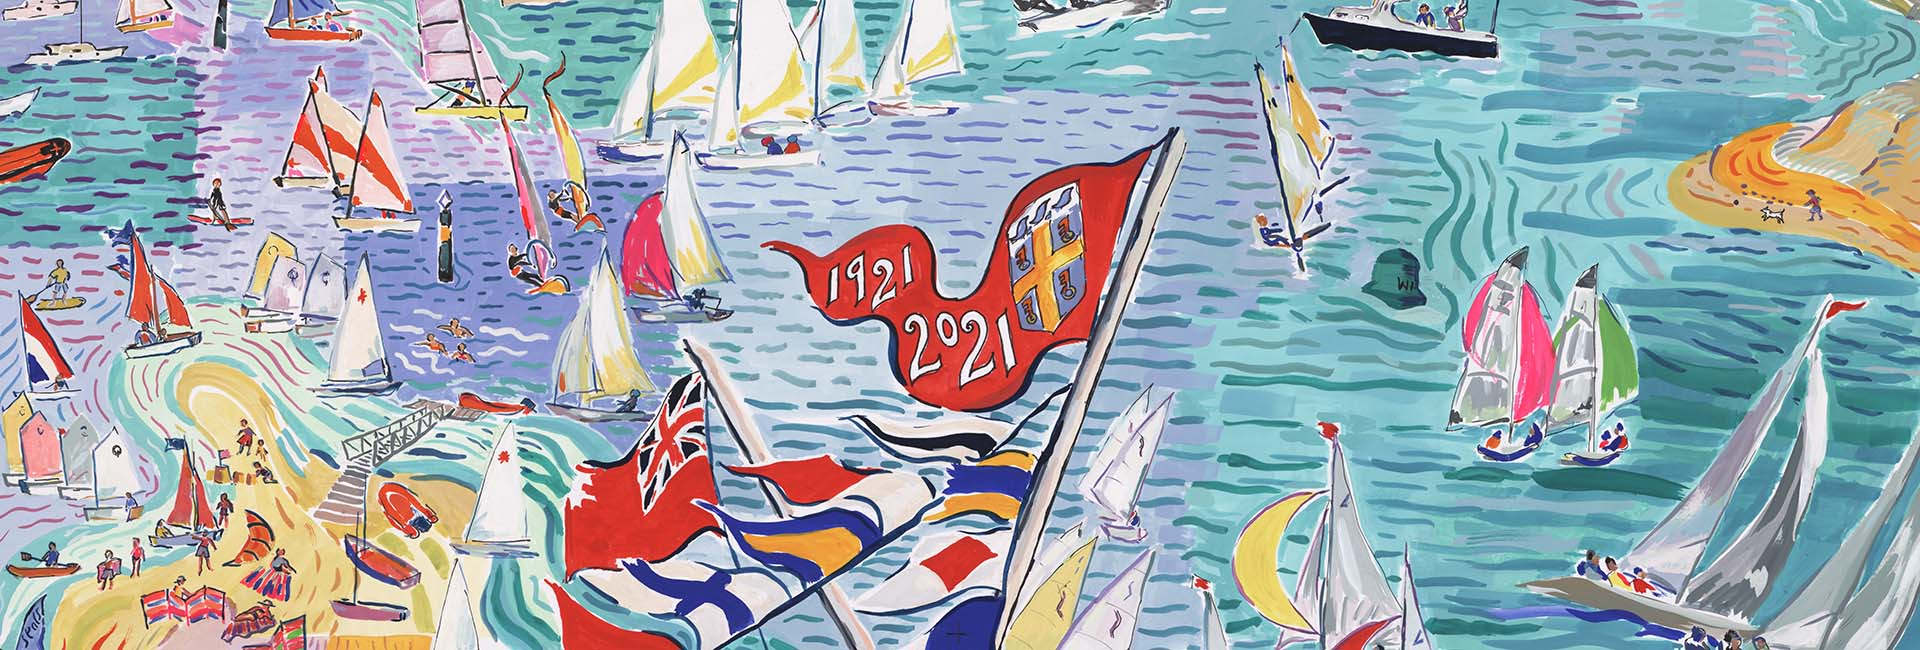 Hayling Island Sailing Club Centenary